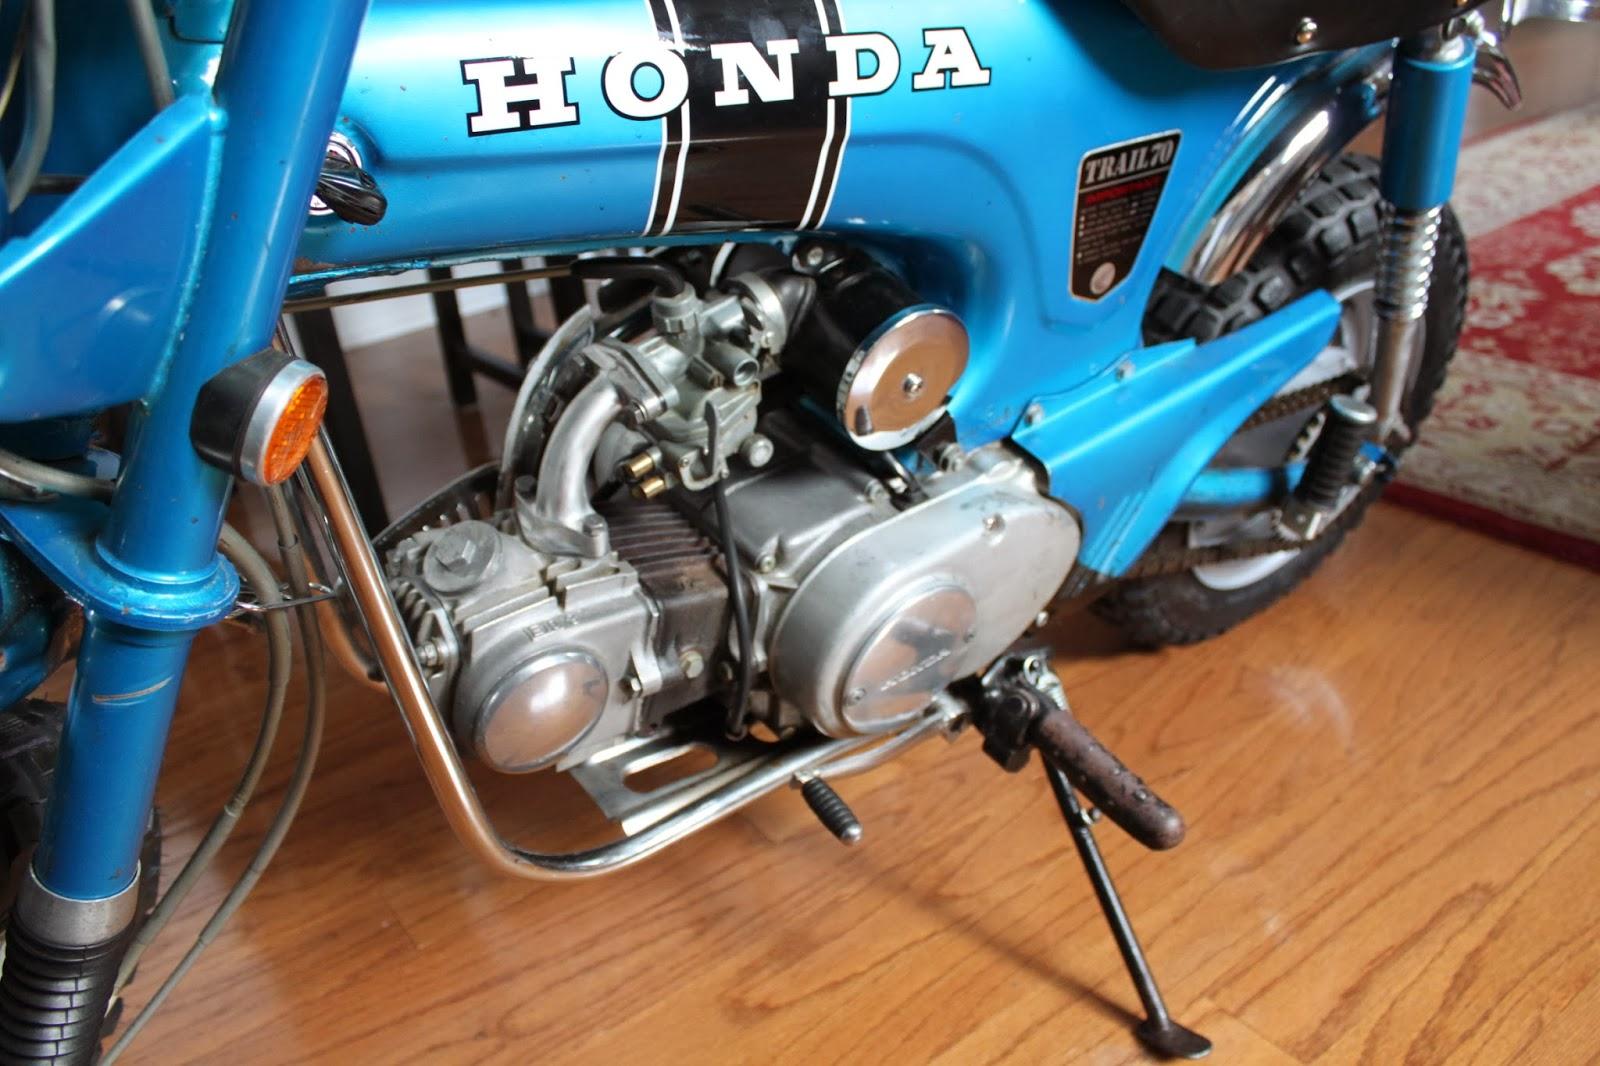 1970 Honda Ct70 Trail Bike 2000 Ann Arbor Grooshs Garage Carburetor Sold November 26 2012